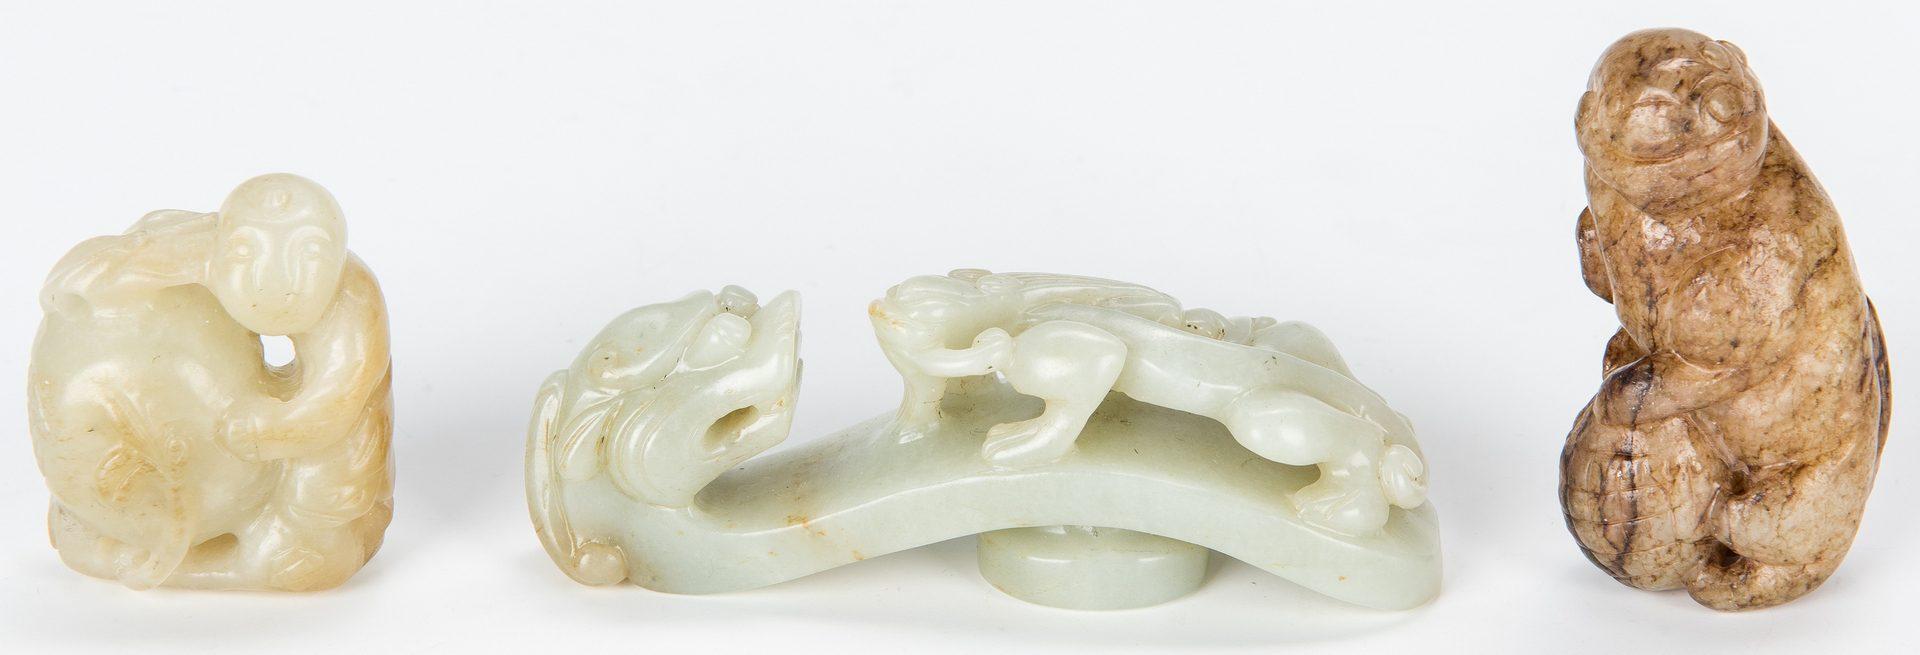 Lot 449: 5 Chinese Jade Figurals & 1 Jade Belt Hook